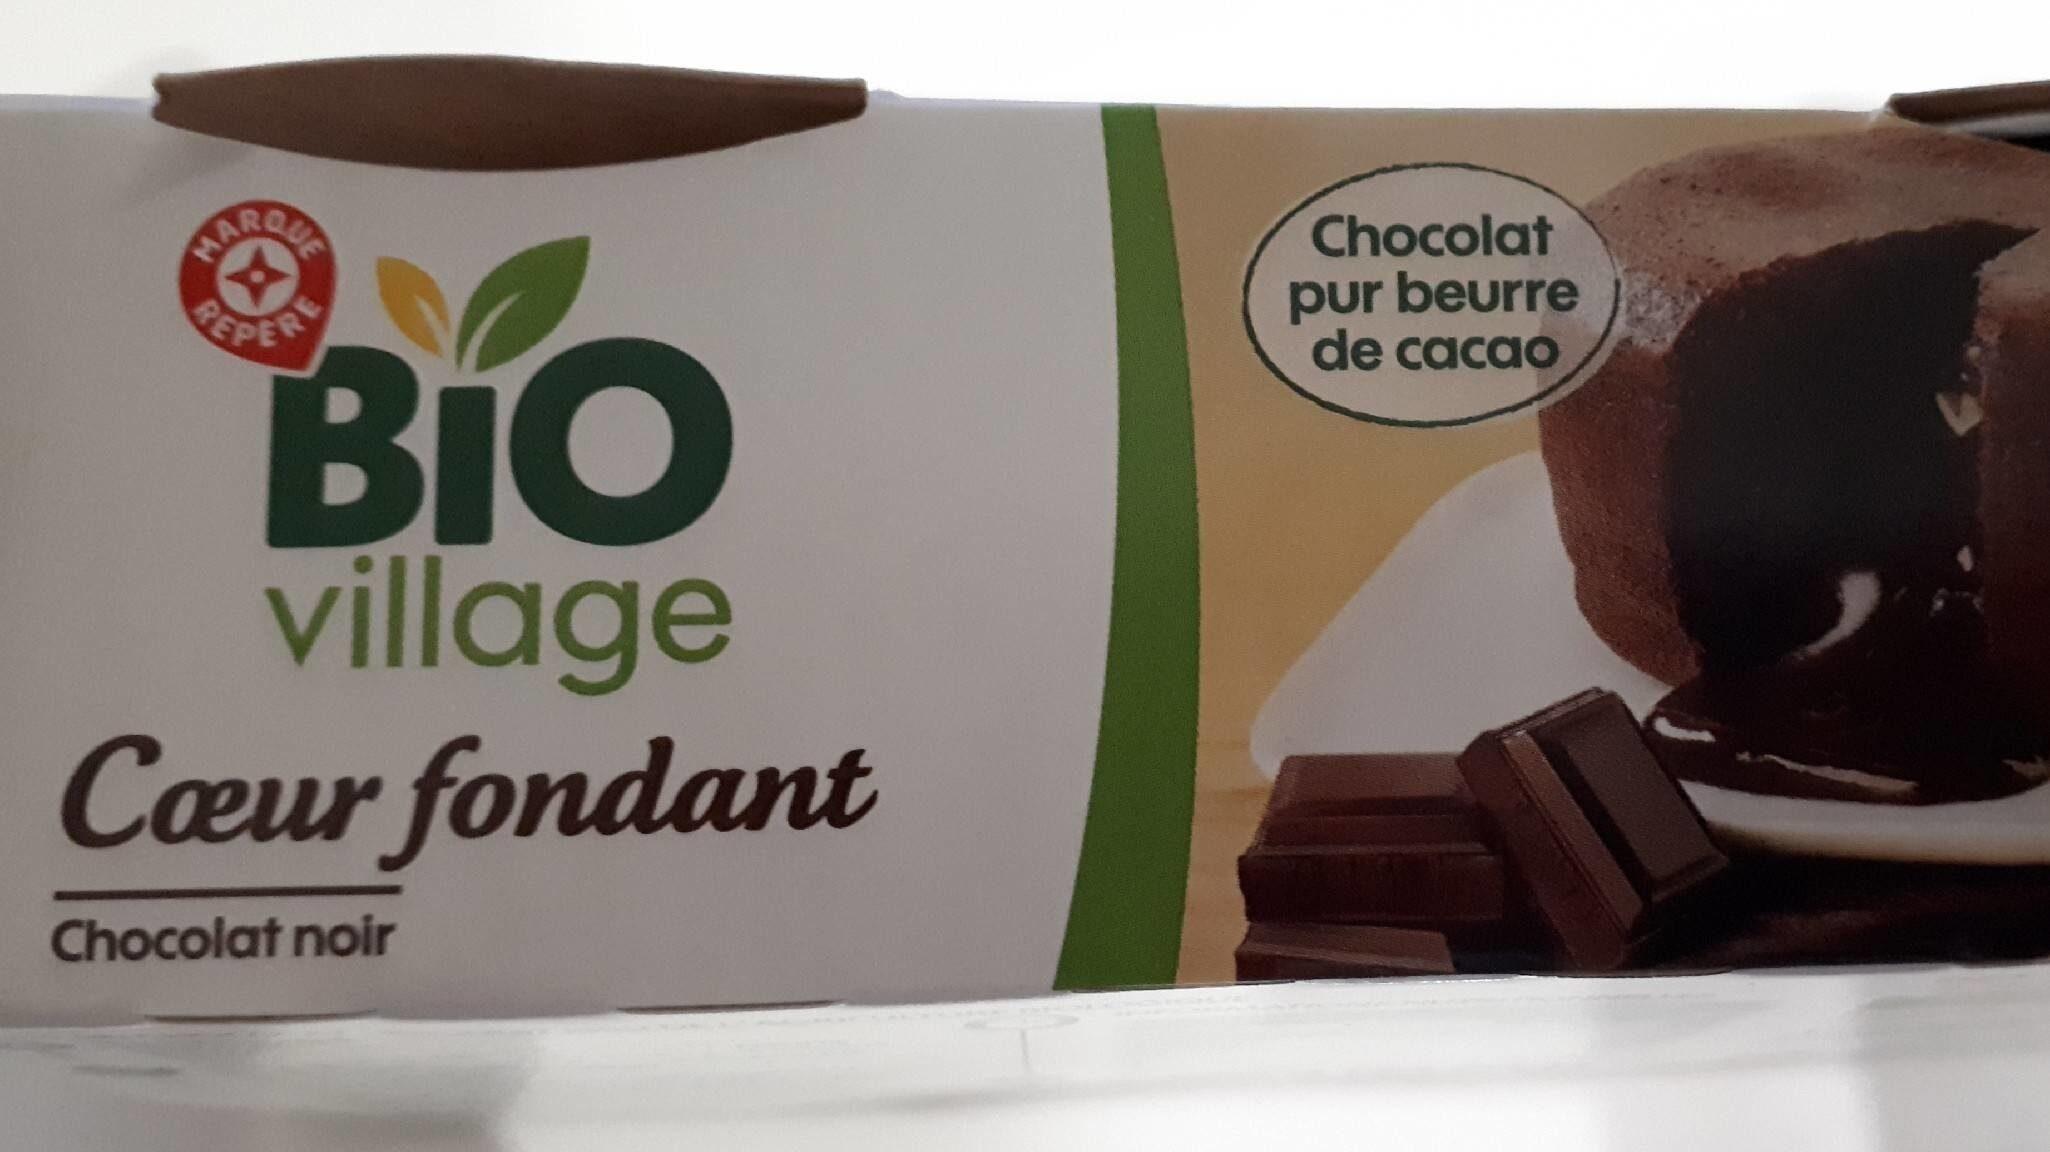 Coeur fondant chocolat noir bio x 2 - Produit - fr